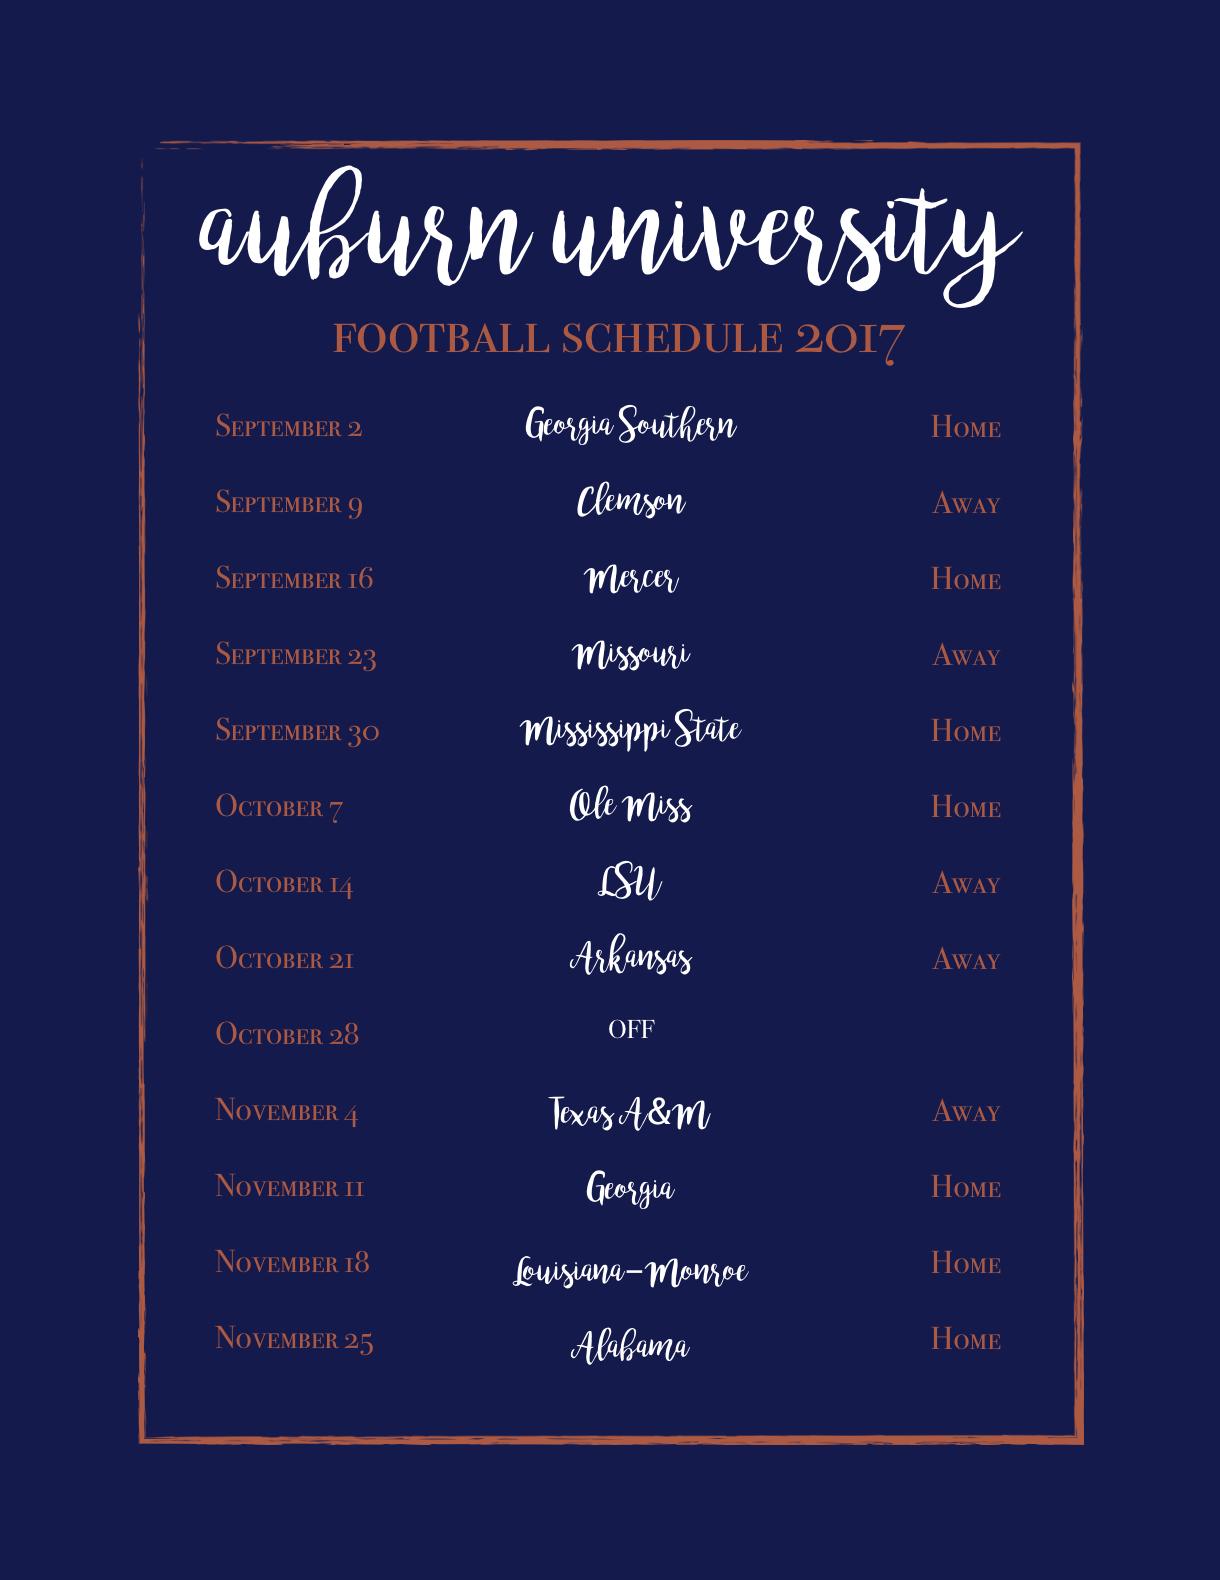 Auburn University Football Schedule 2017 | Auburn | Auburn